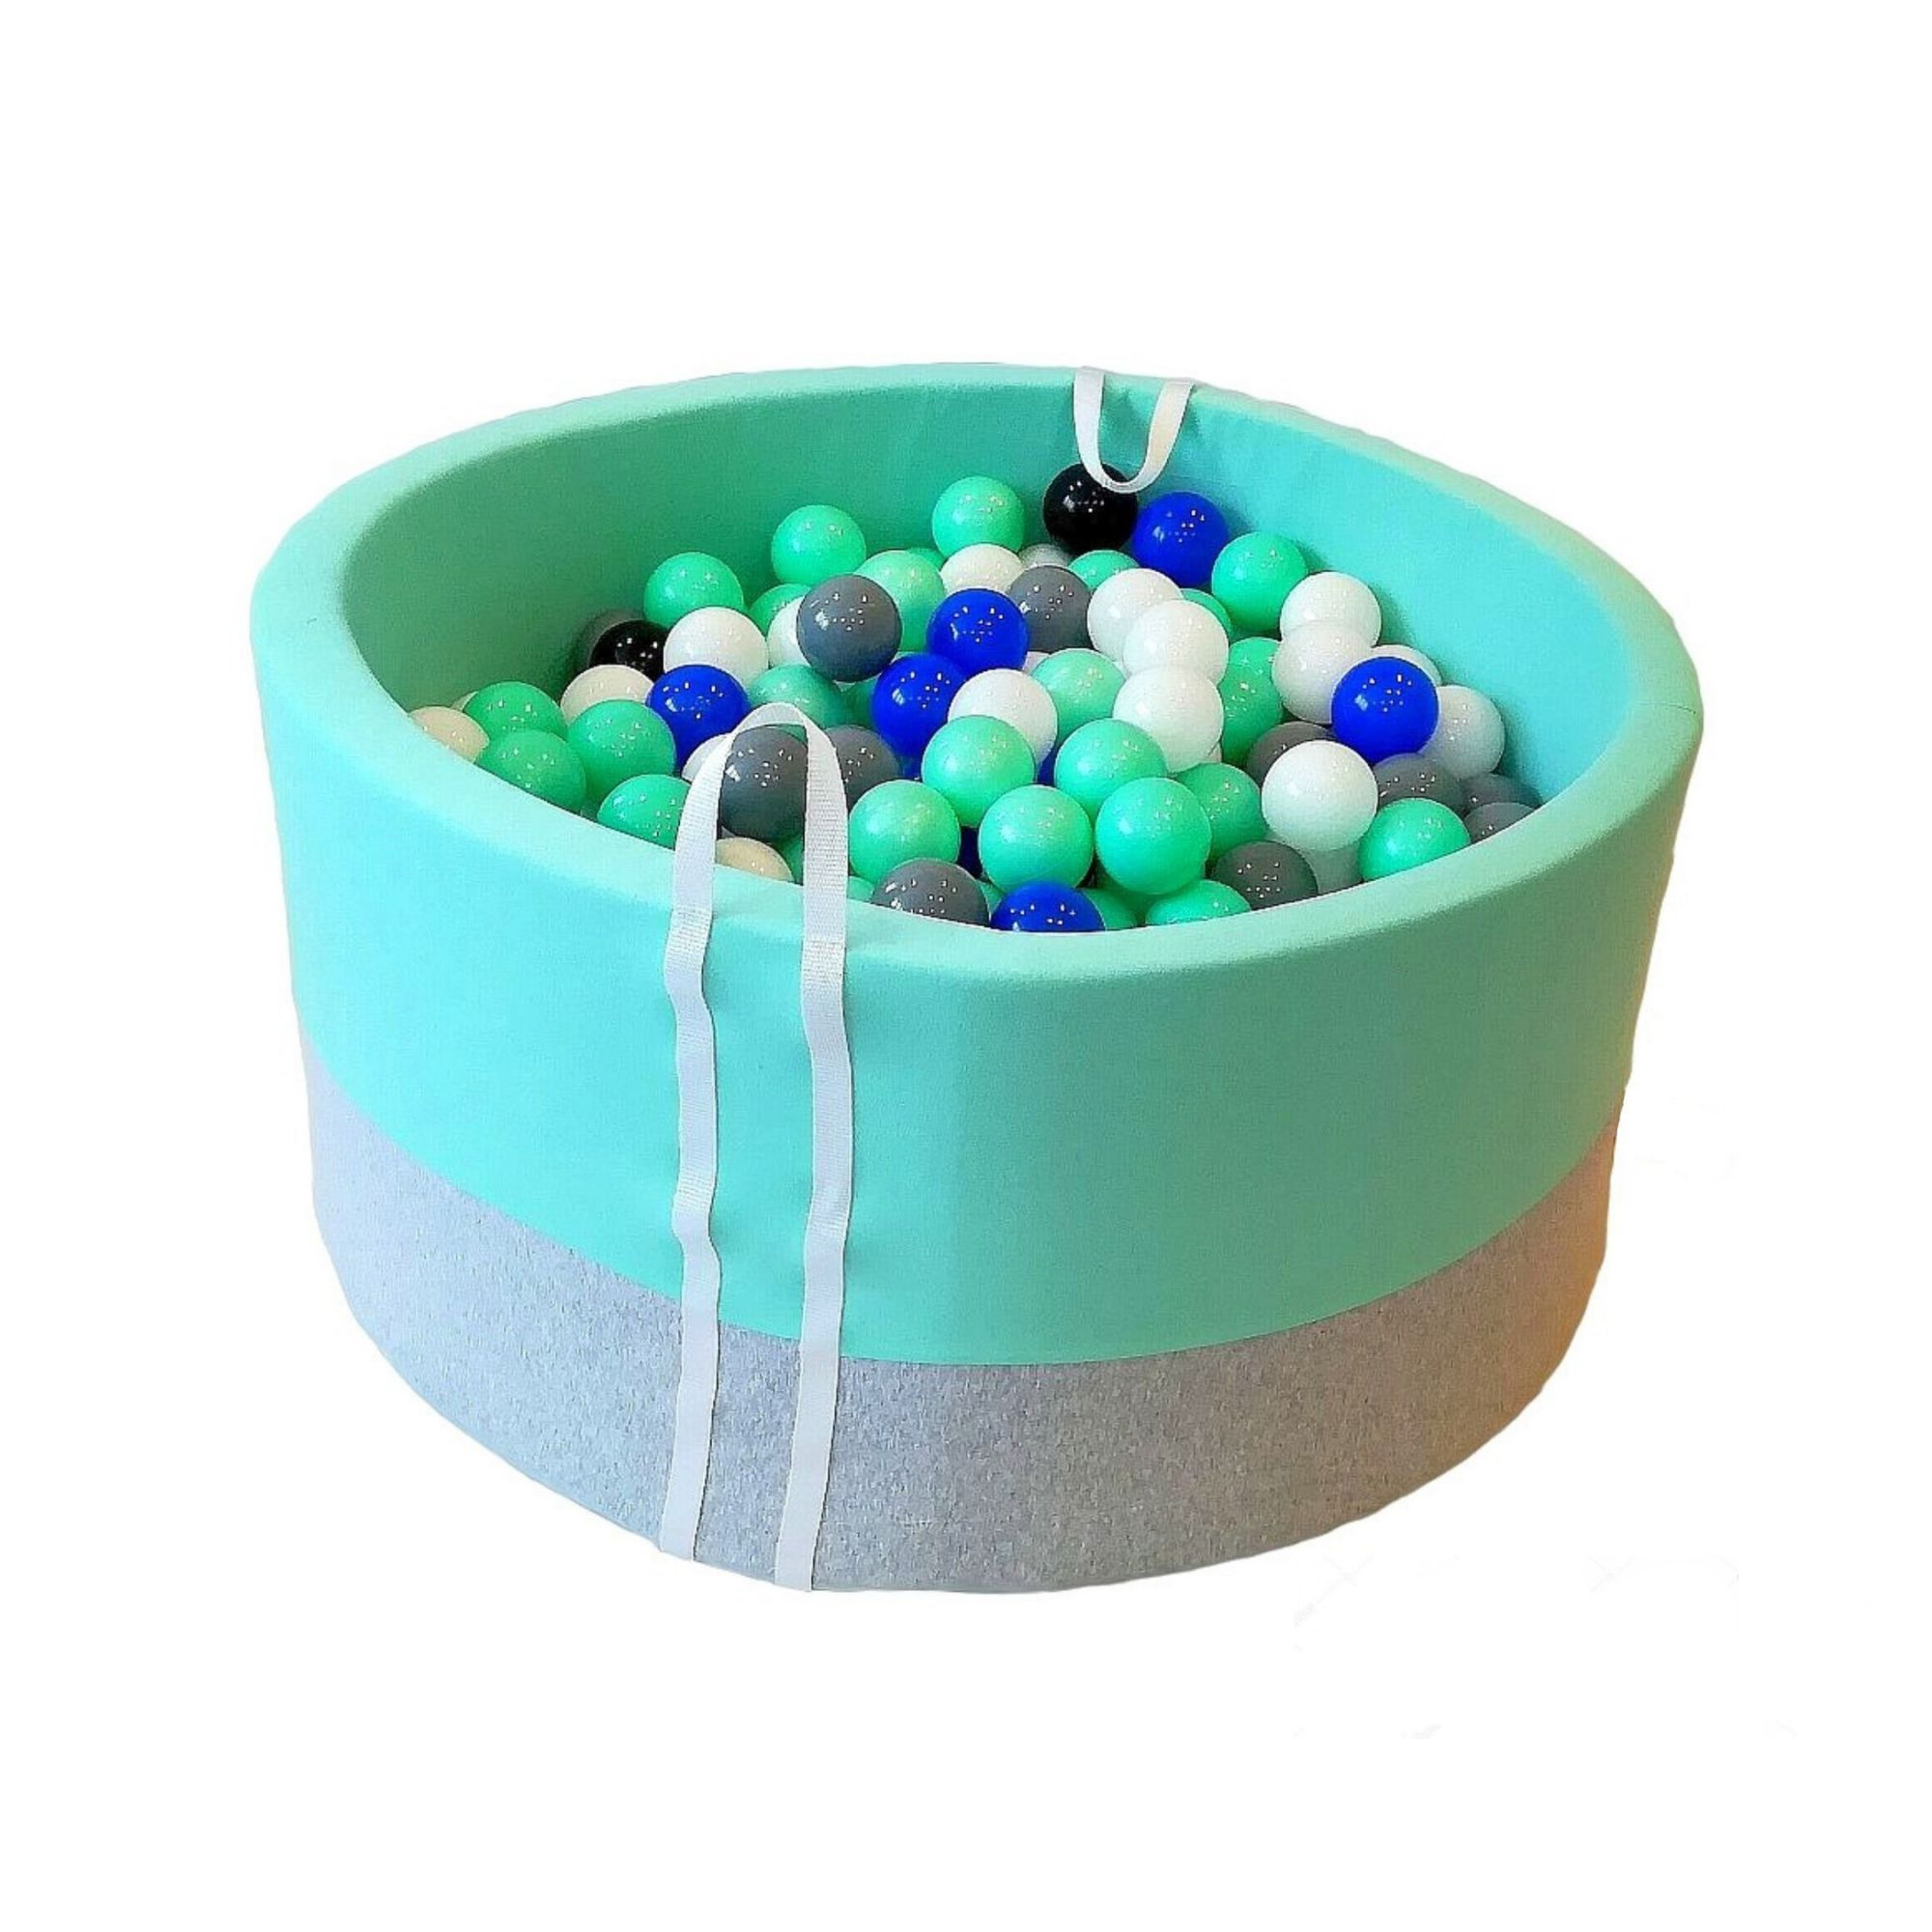 Suchy Basen Z Kulkami Babyball Melanz Z Mieta Zabawa Ktora Sie Nie Nudzi Baby Ball Ball Learning Colors